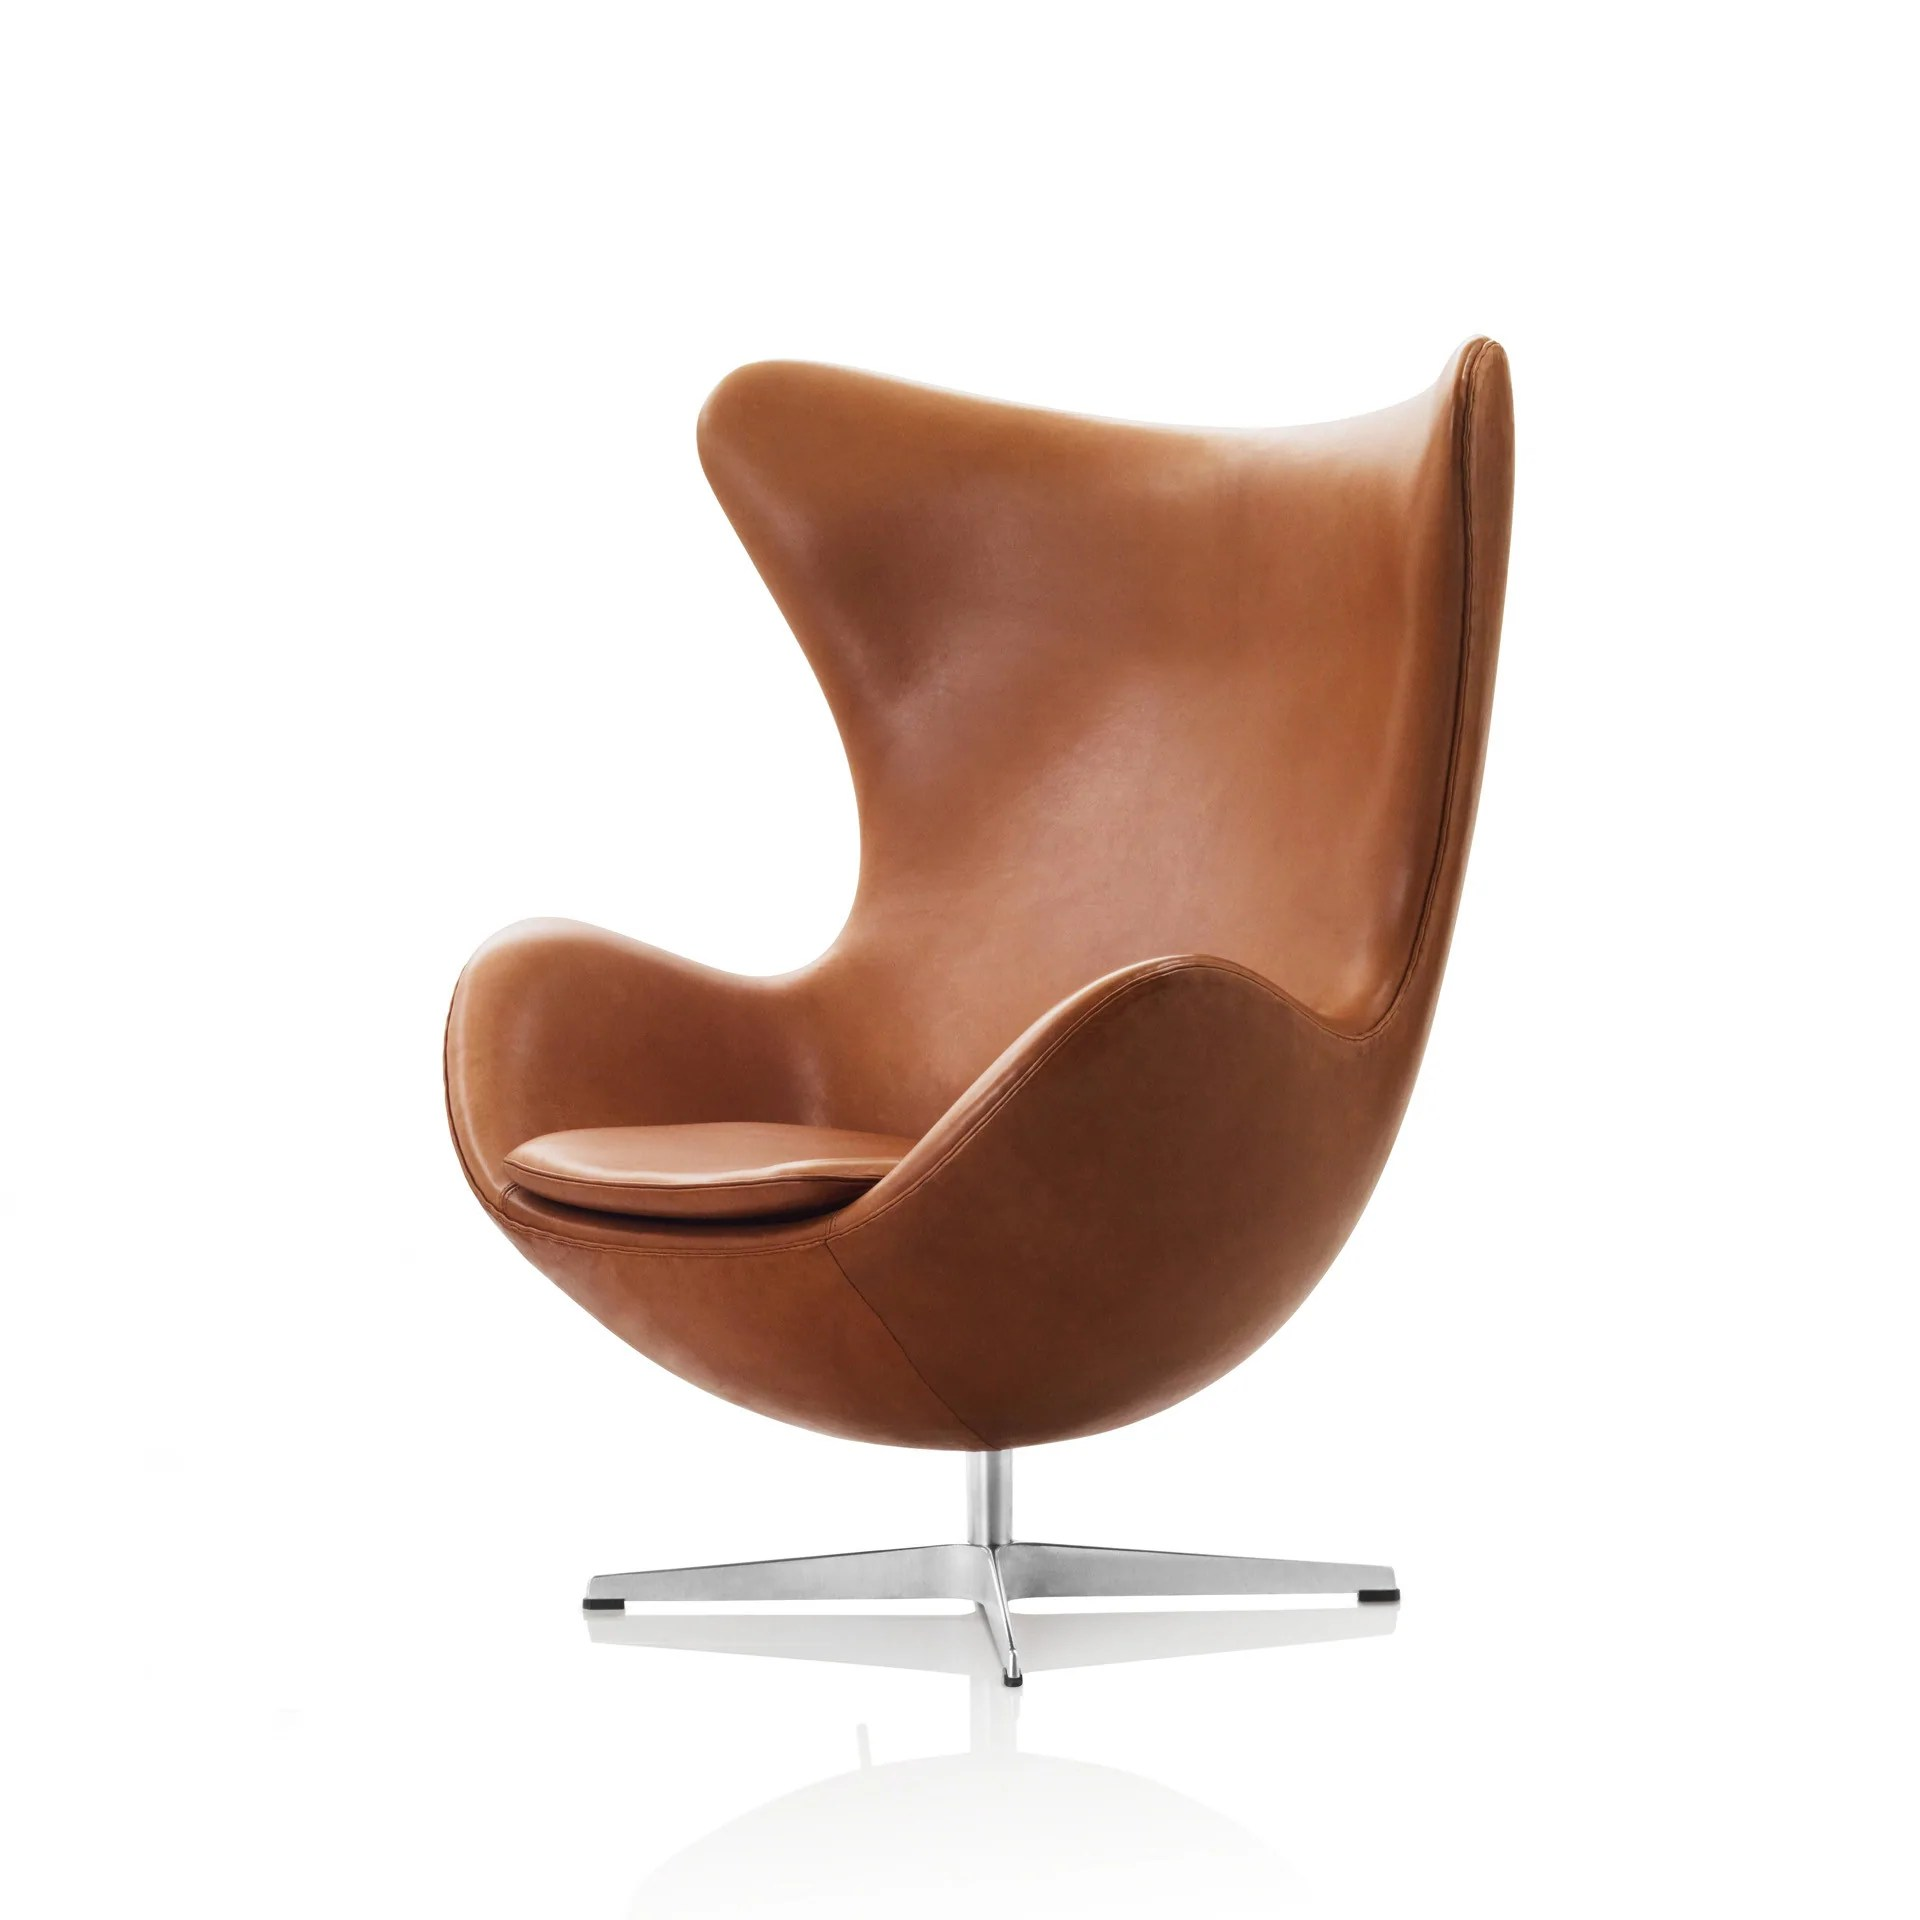 Miraculous Sofa Potato Couch Potato Furniture Sofa Armchair Pdpeps Interior Chair Design Pdpepsorg